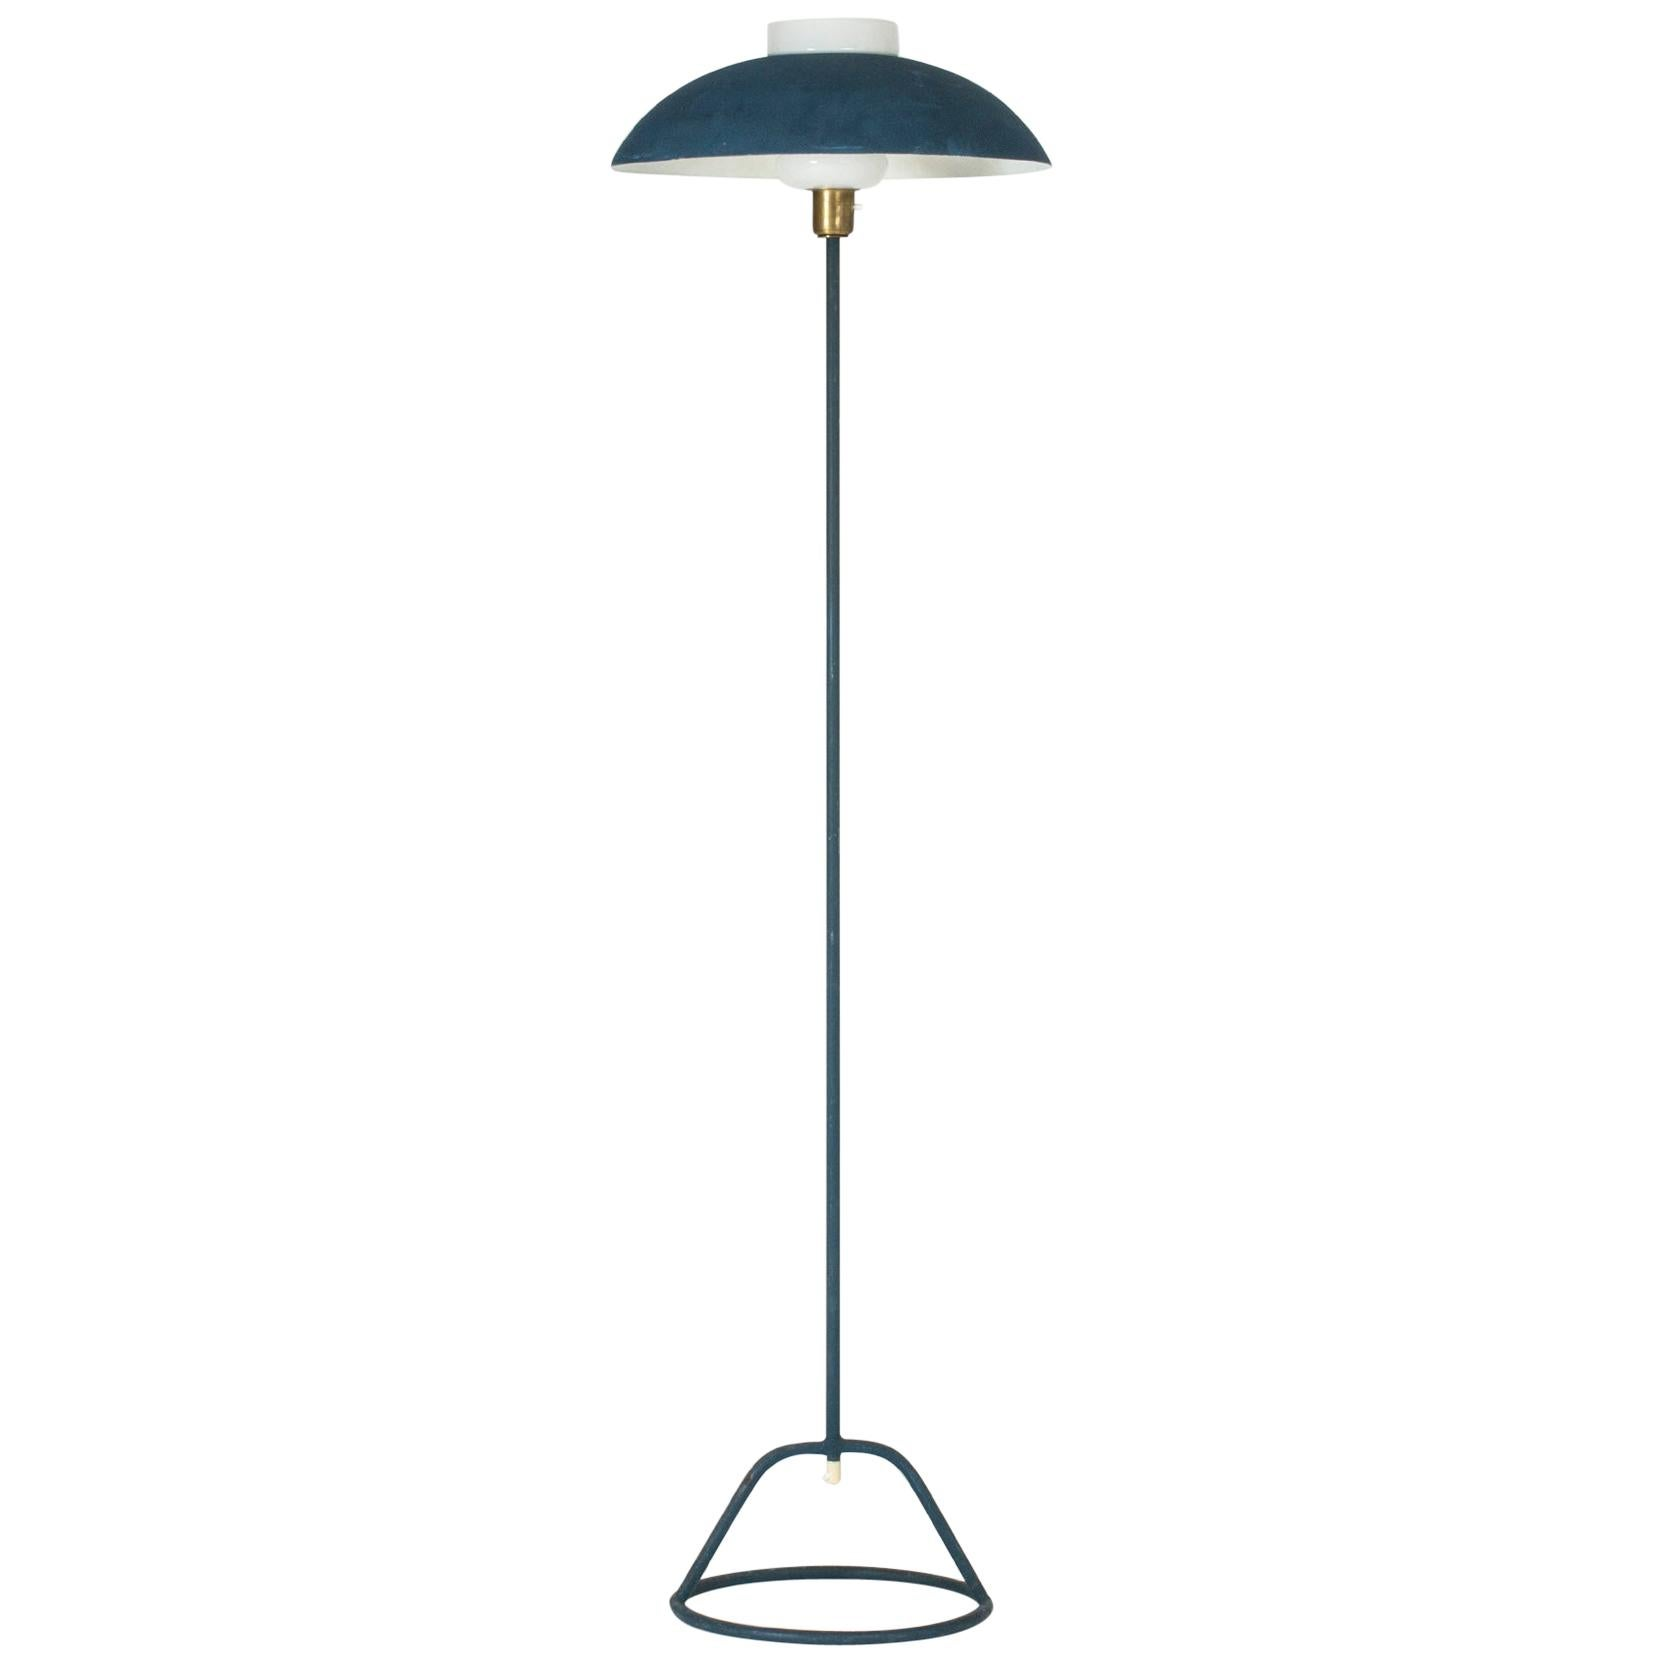 Midcentury metal floor lamp by Bertil Brisborg